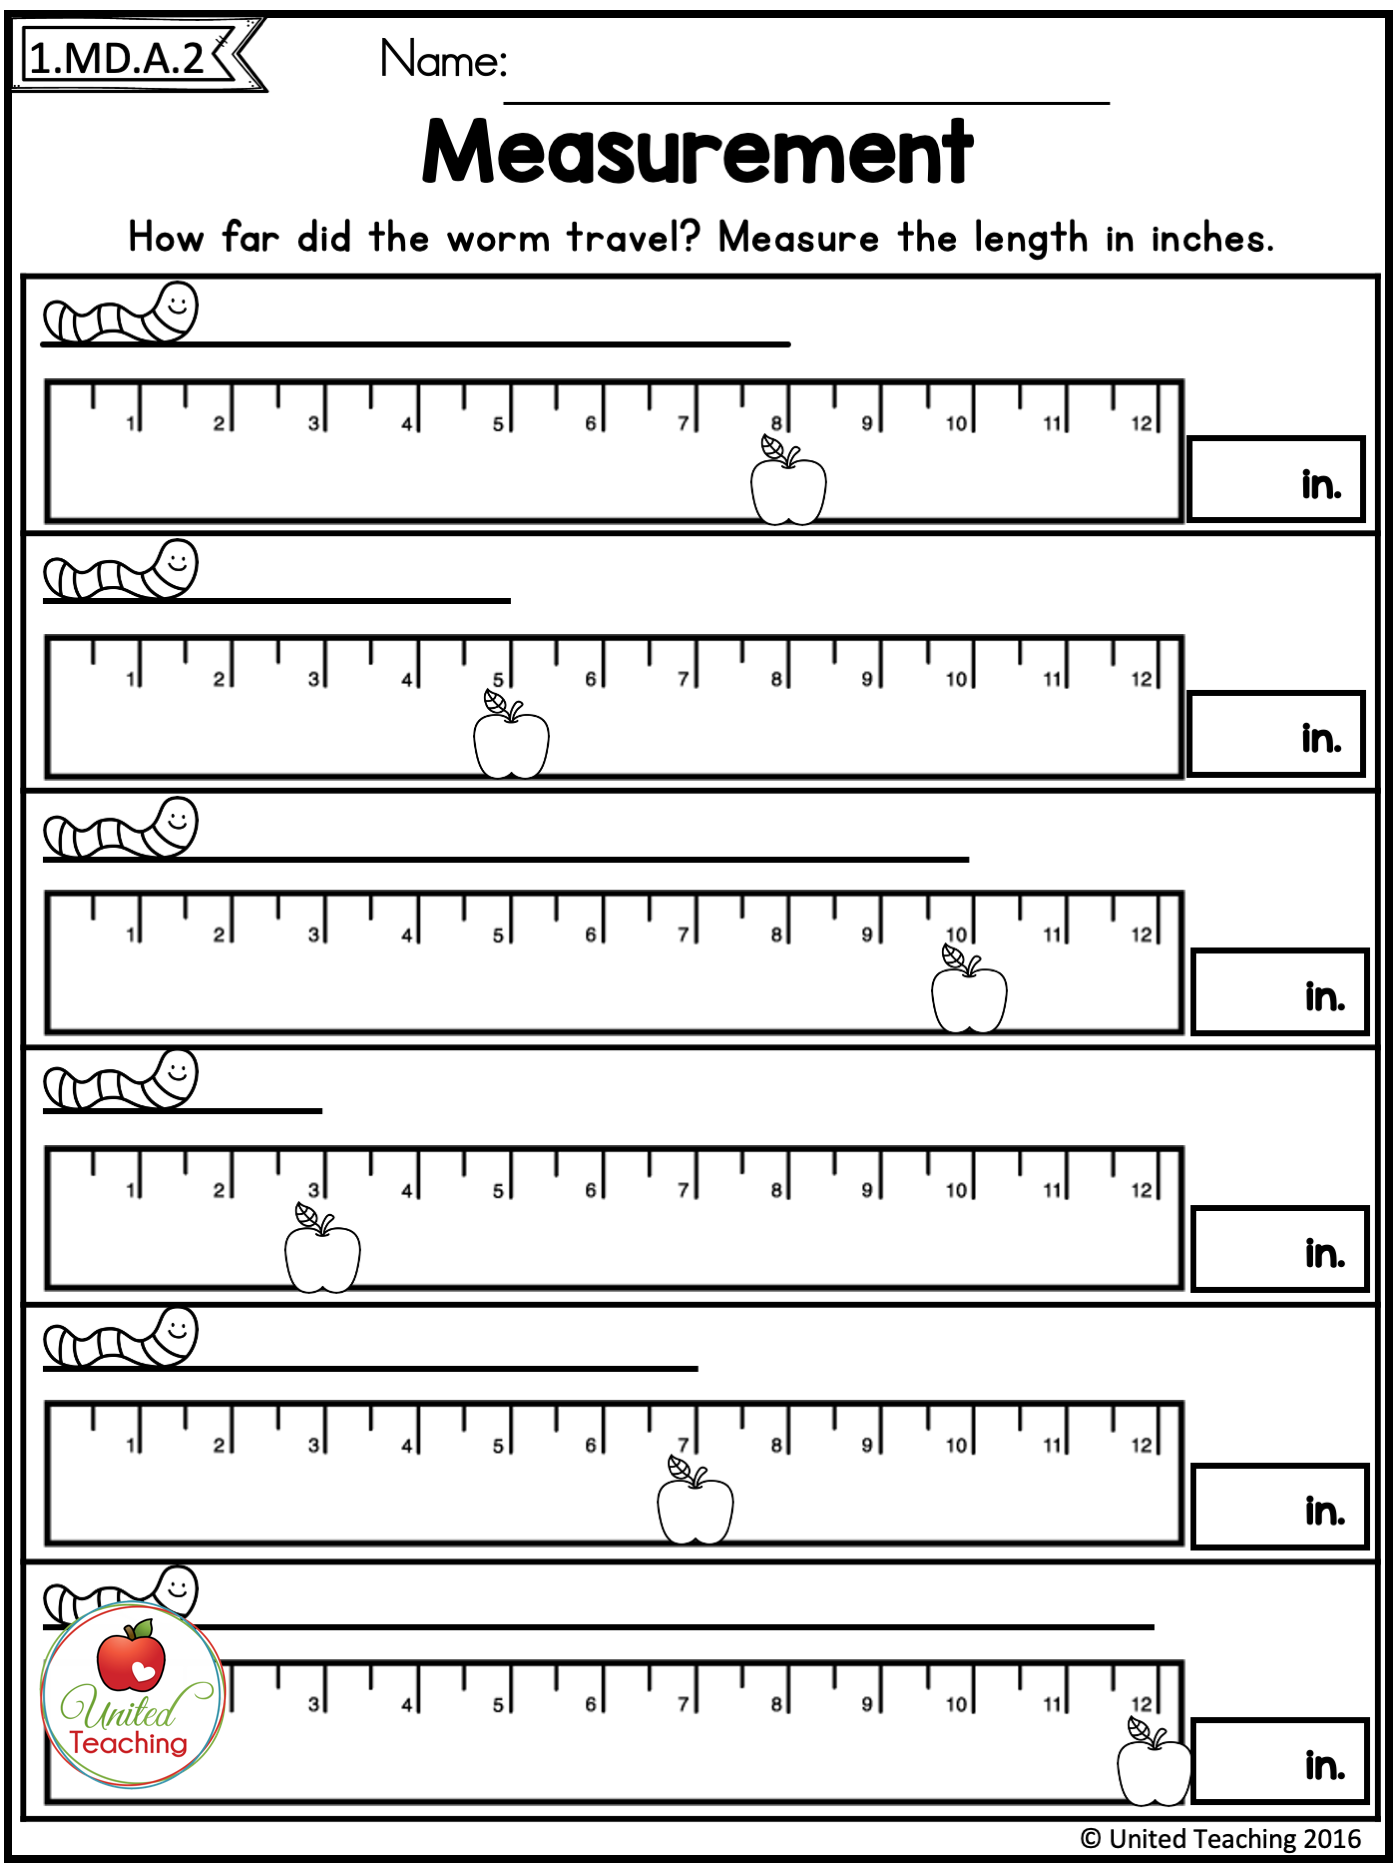 hight resolution of FALL MATH ACTIVITIES (1ST GRADE) - United Teaching   Measurement  activities